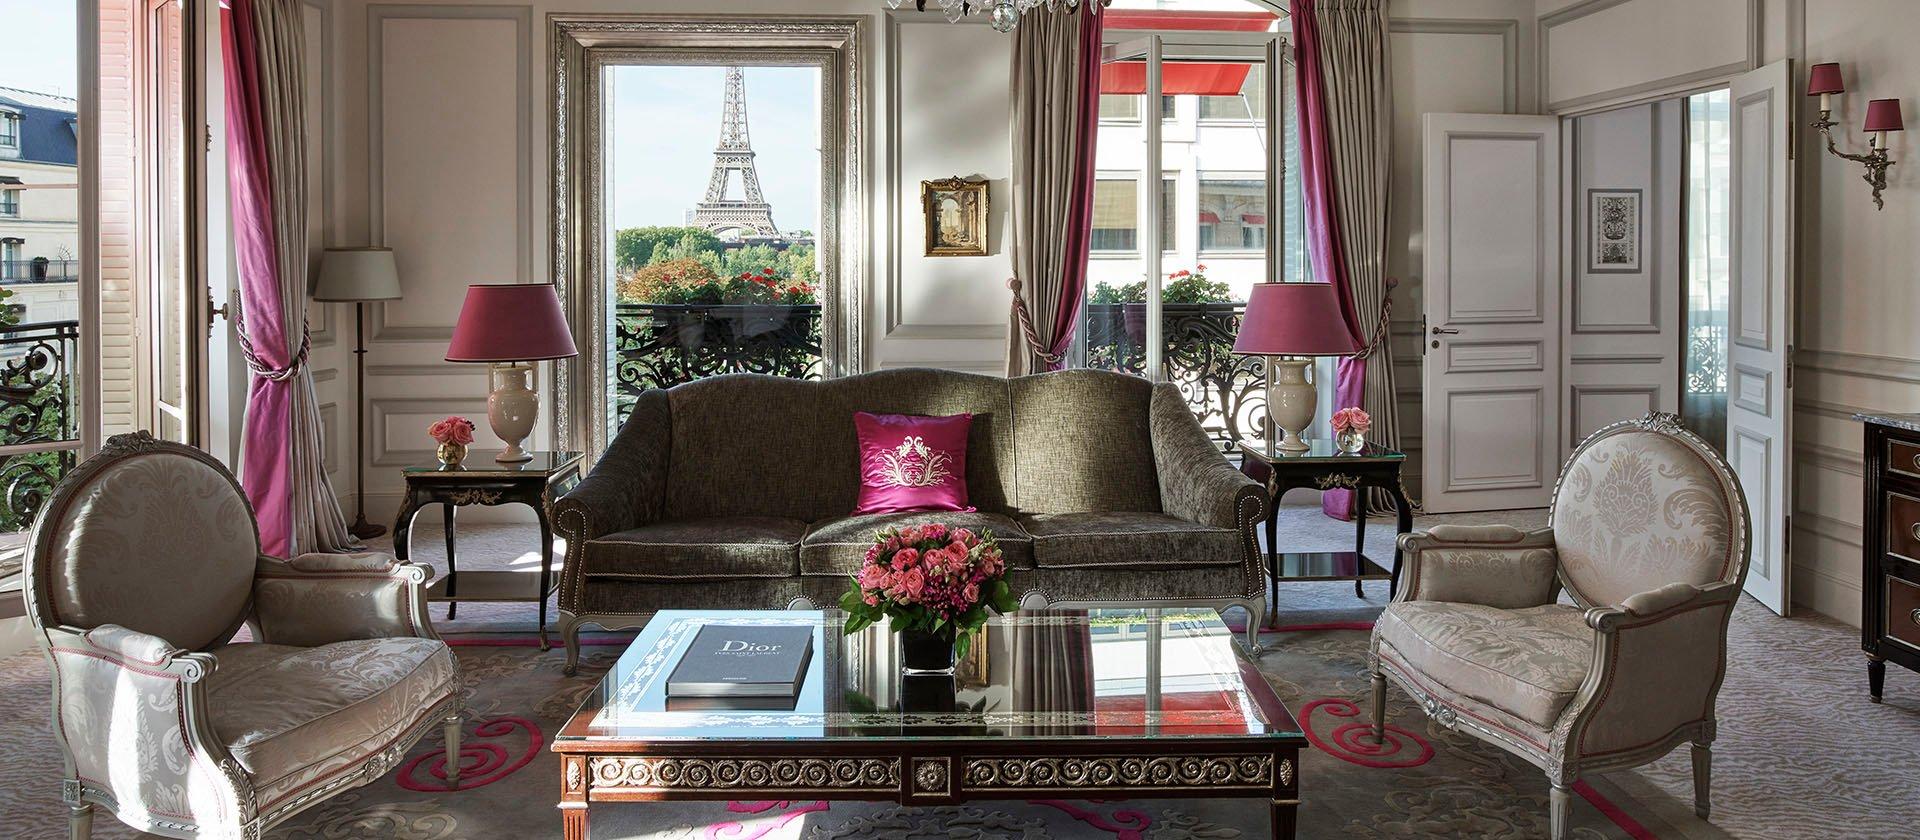 Hotel Plaza Athenee, Paris, Eiffel Suite